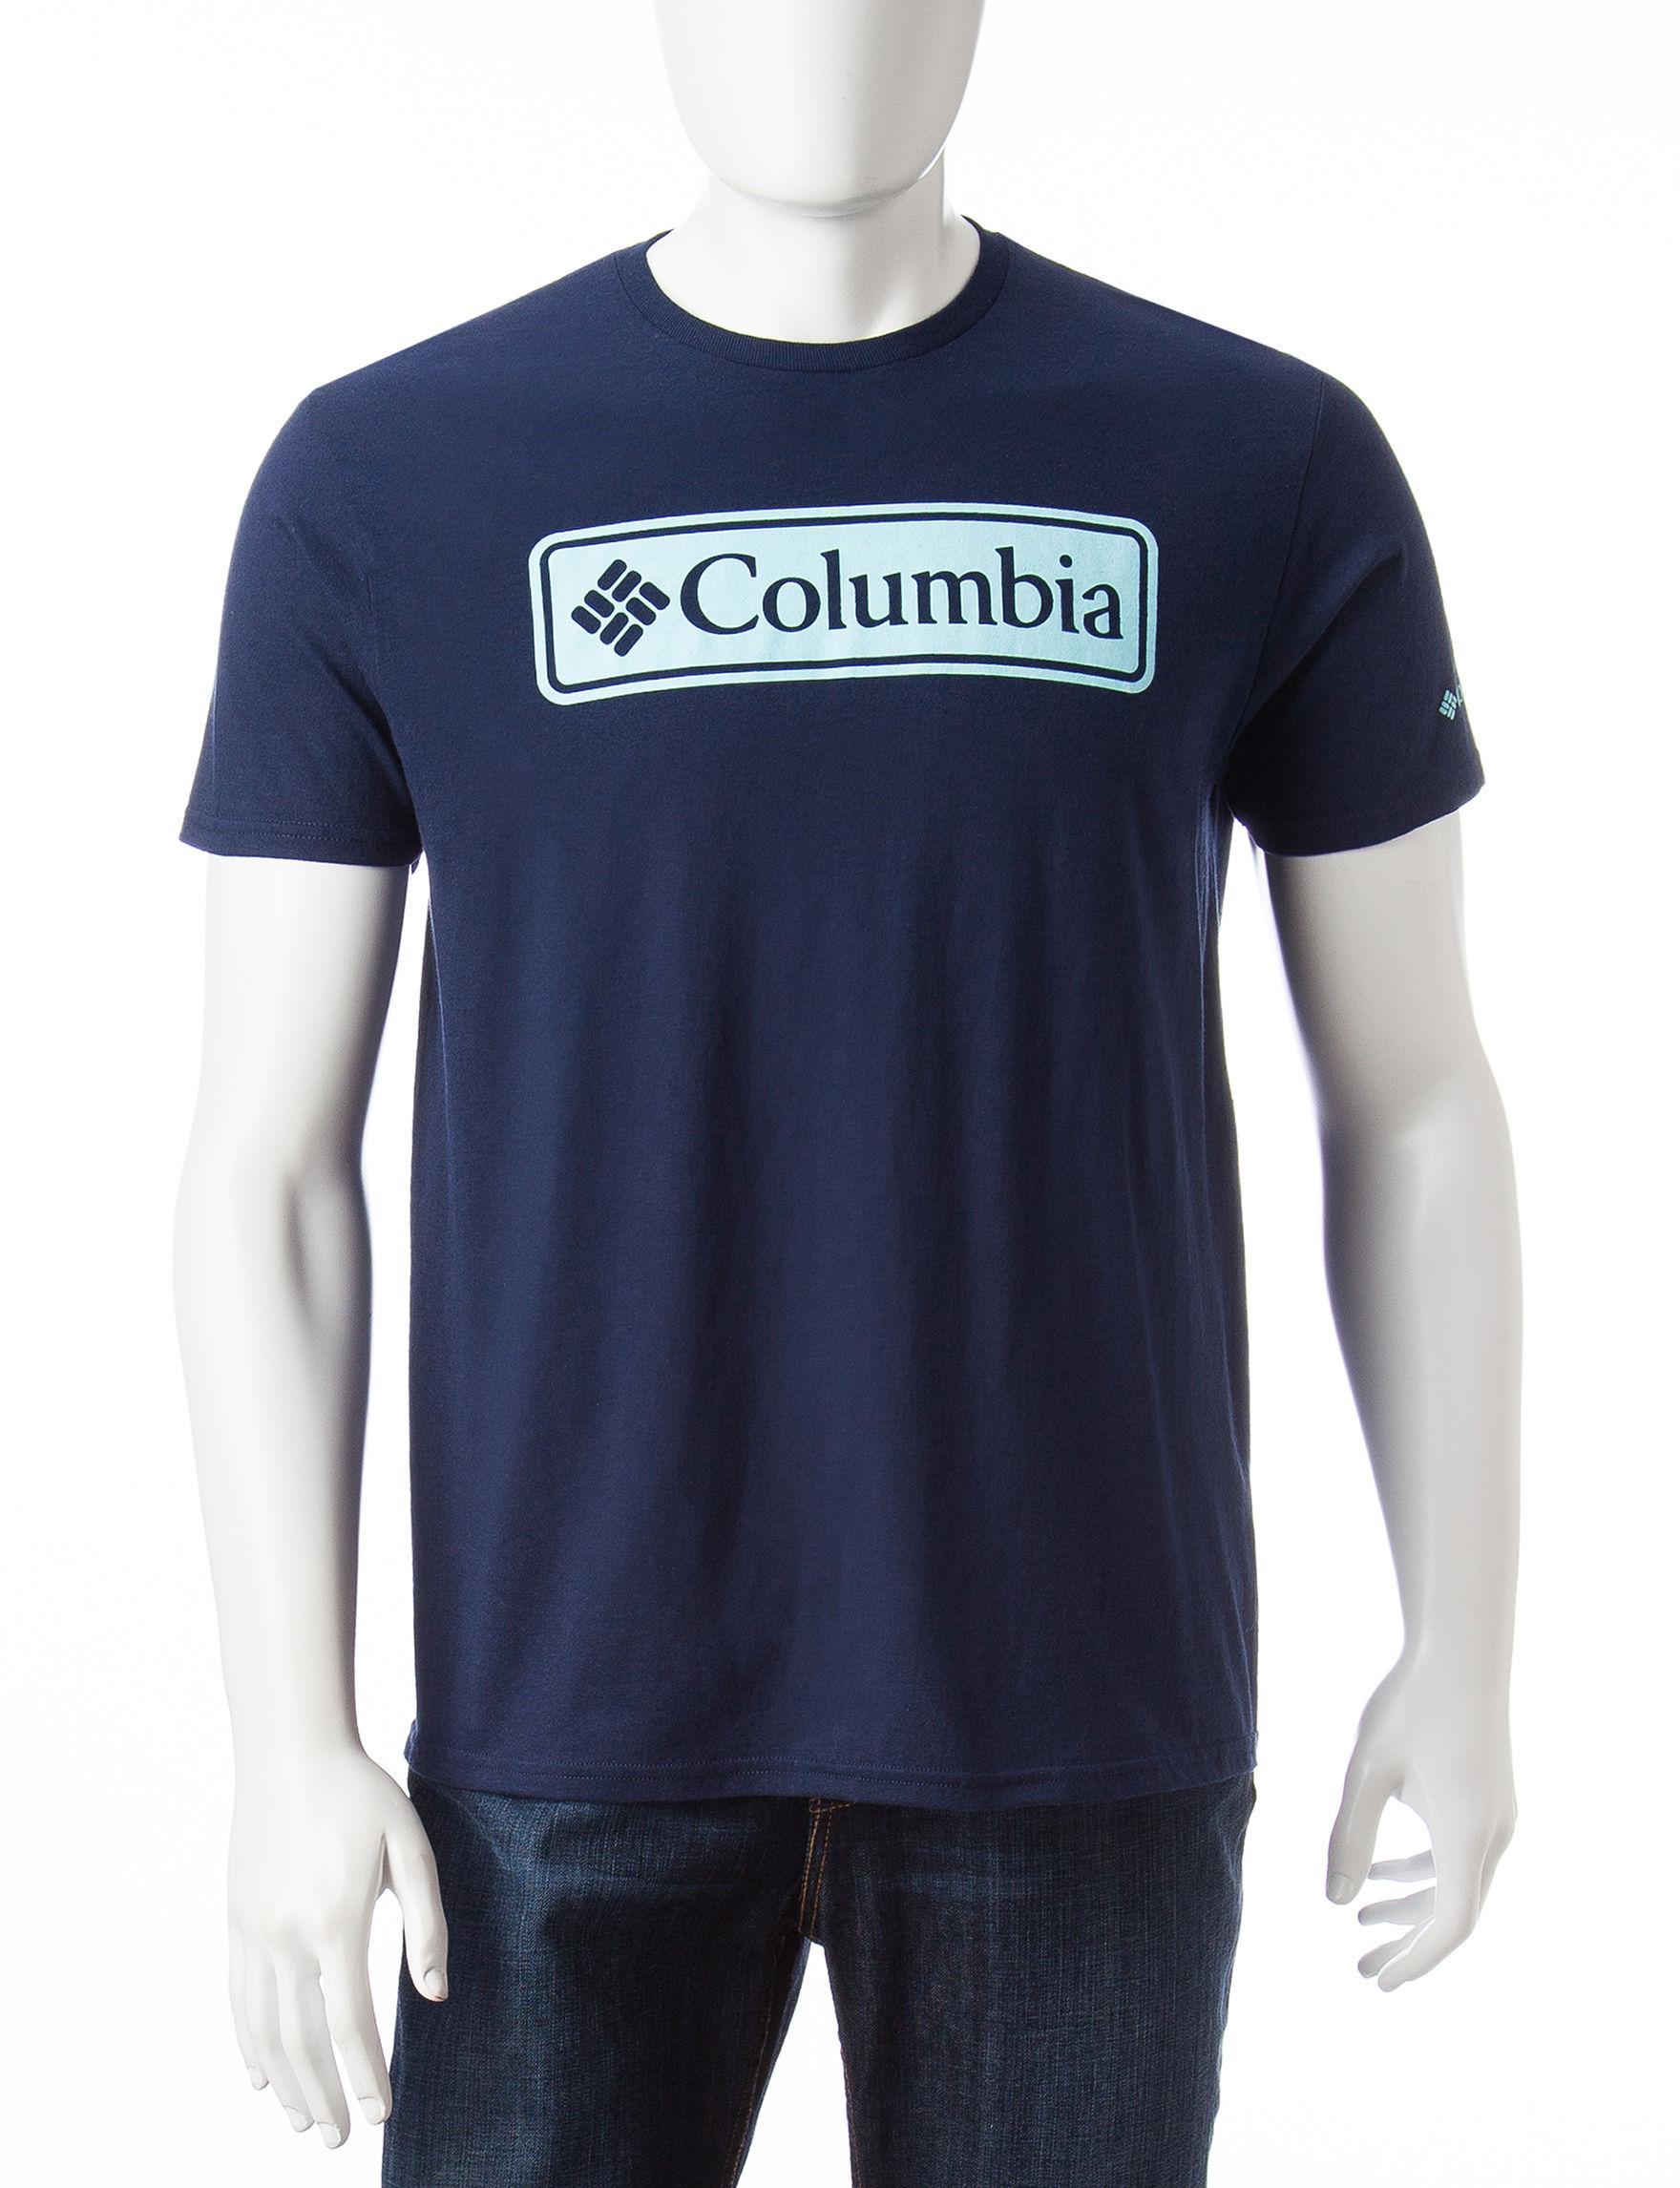 Columbia Navy Tees & Tanks